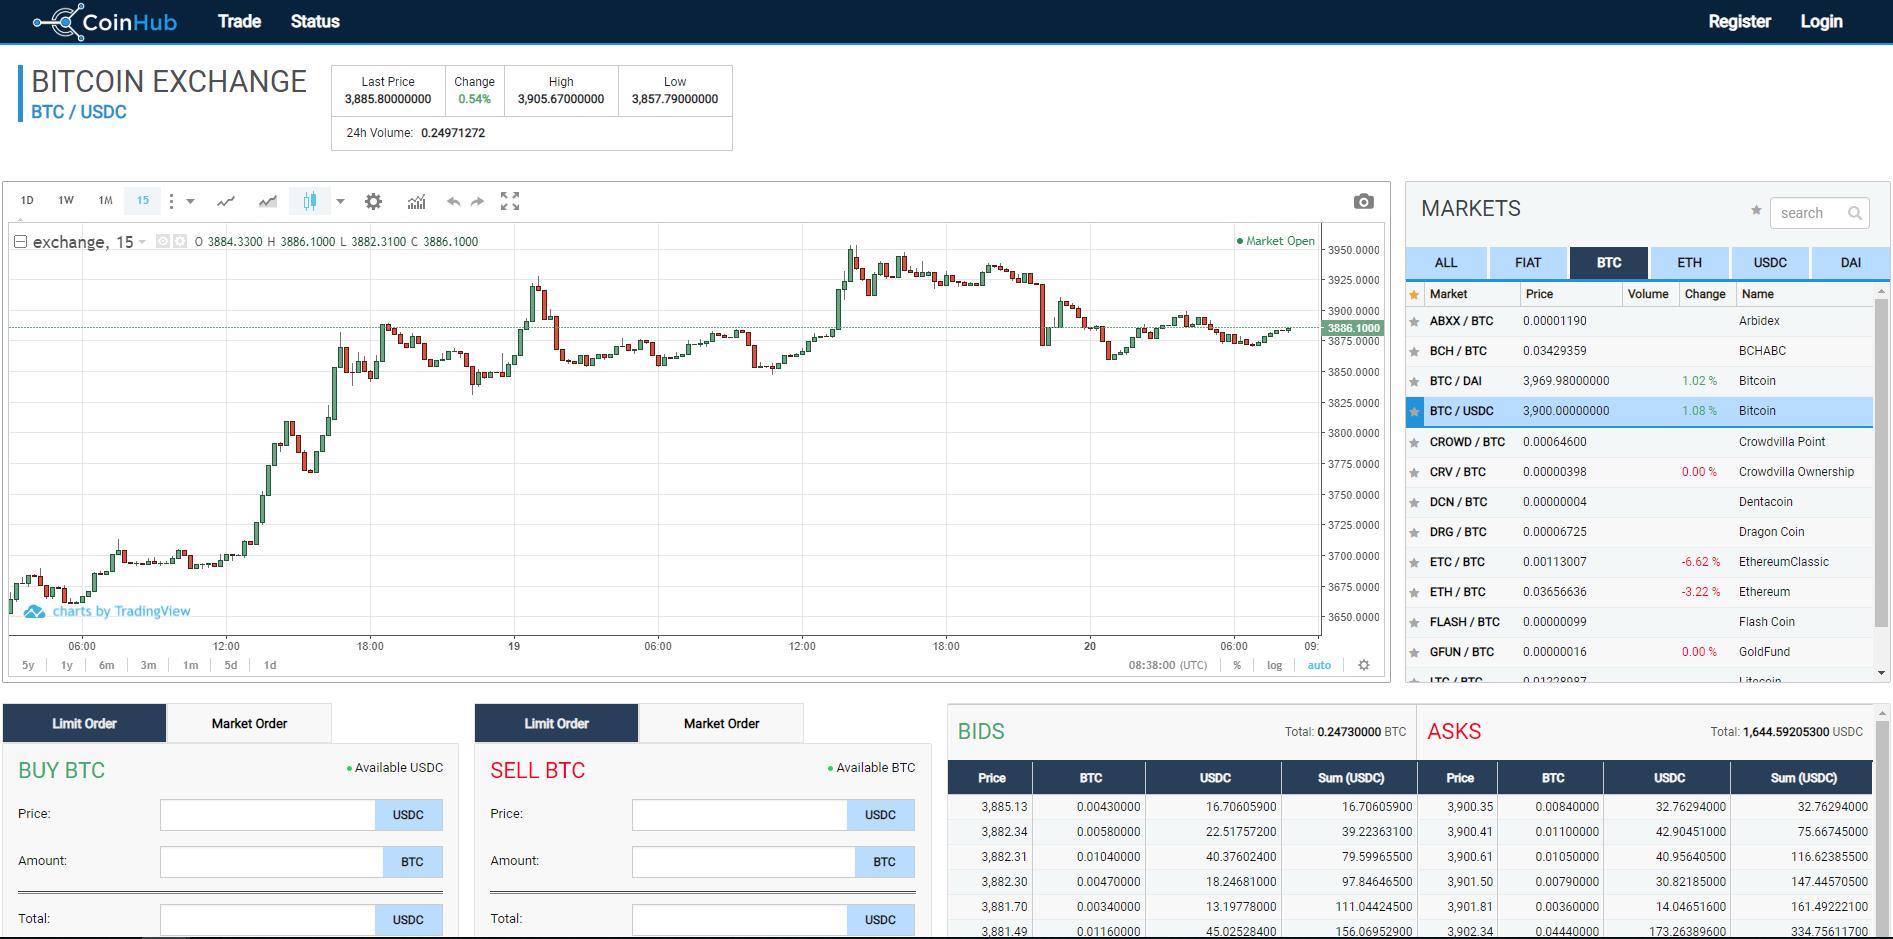 Coinhub-Trading-Chart-1